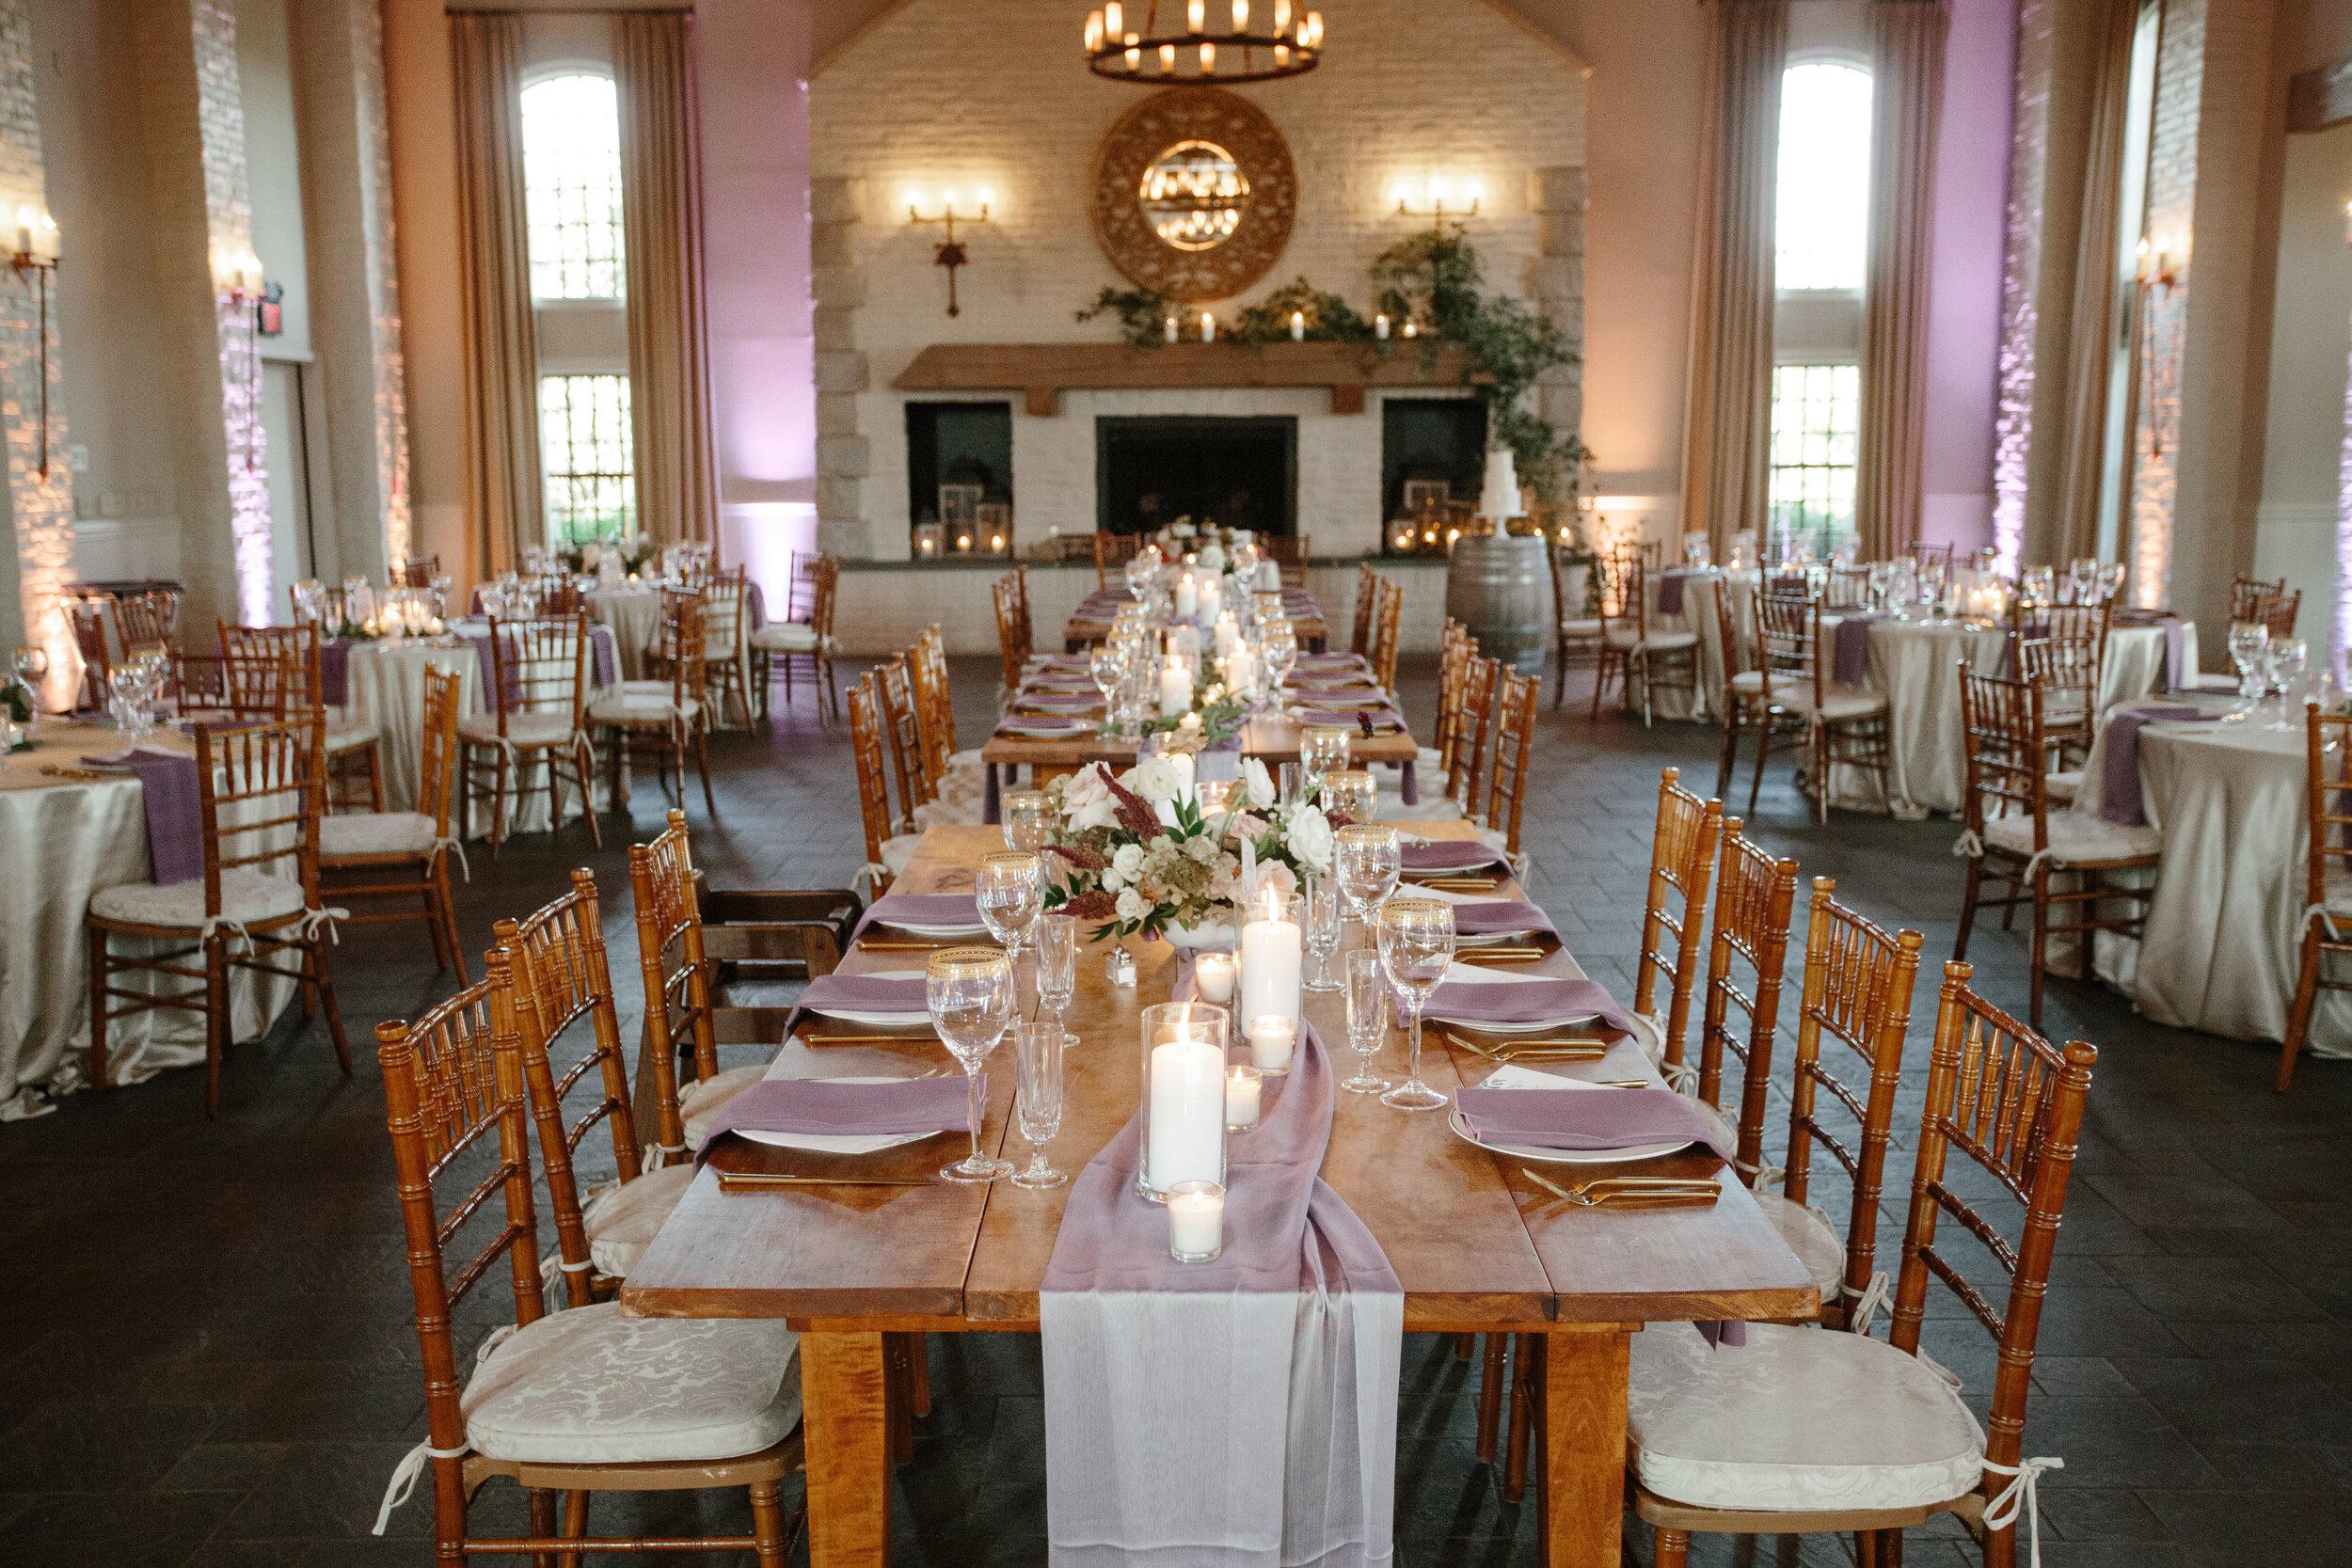 Shante-Asteway-Wedding-Andrew-Roby-Events-9.jpg